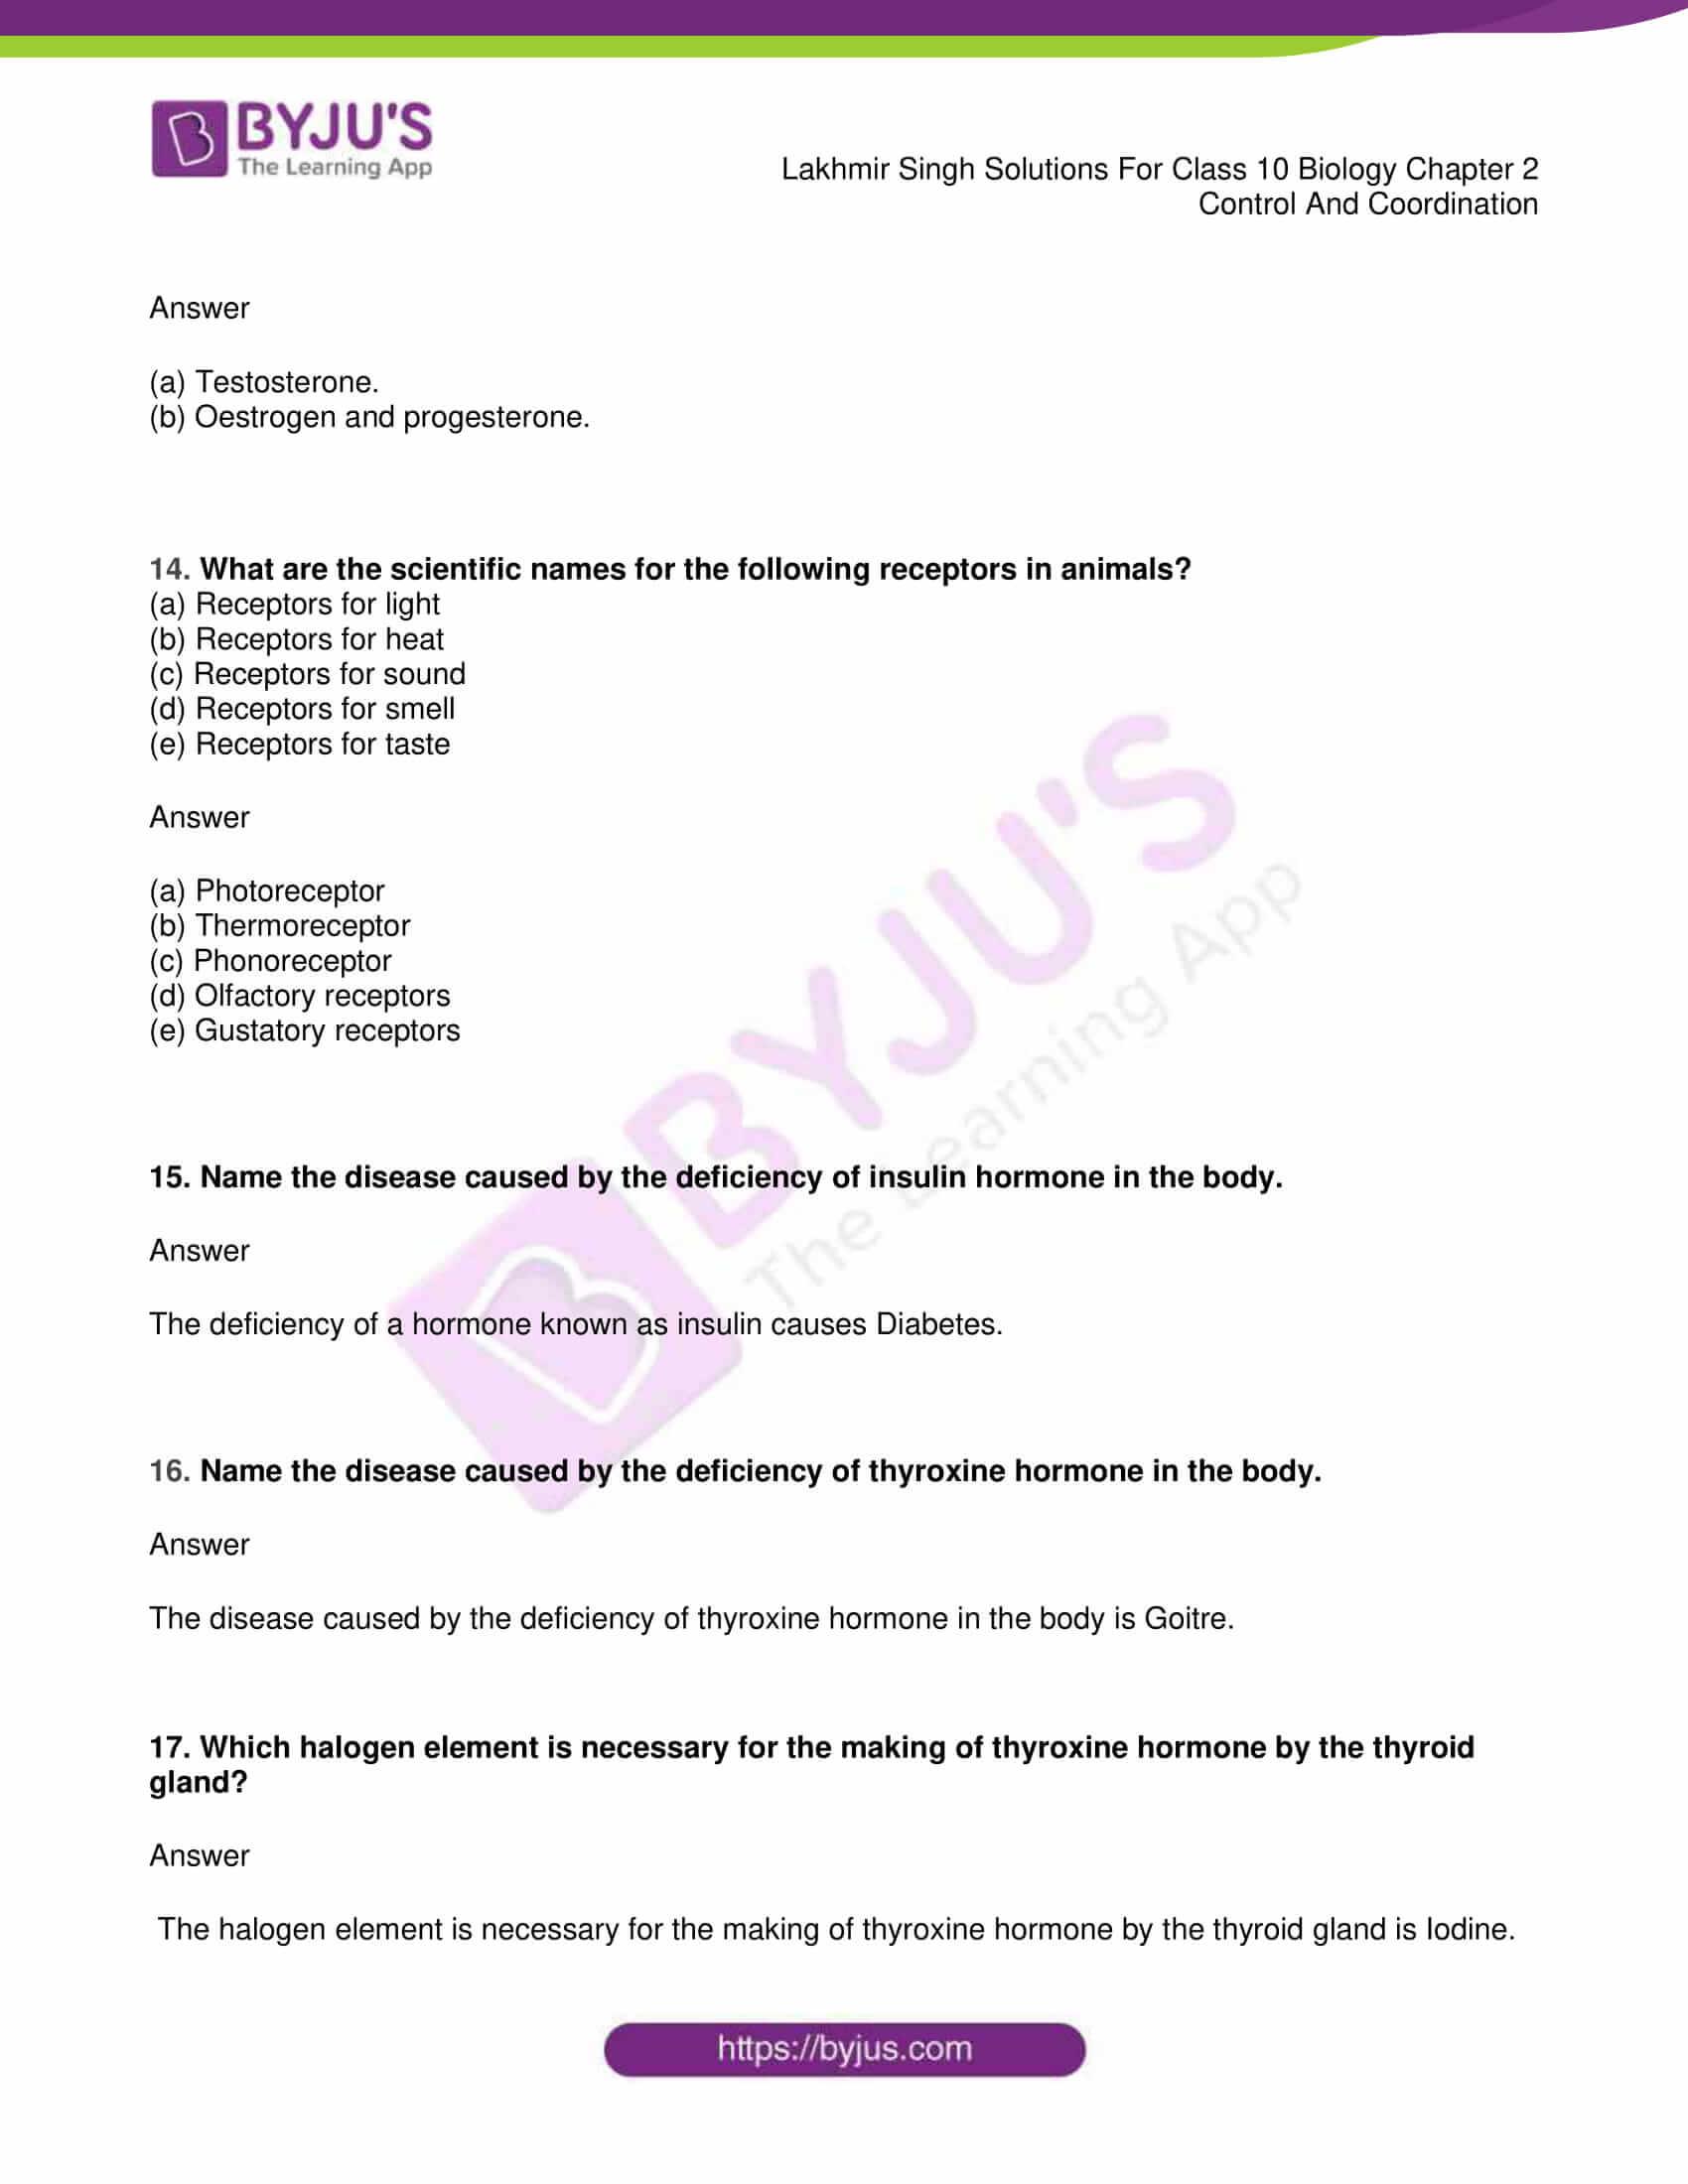 lakhmir singh sol class 10 biology chapter 2 25